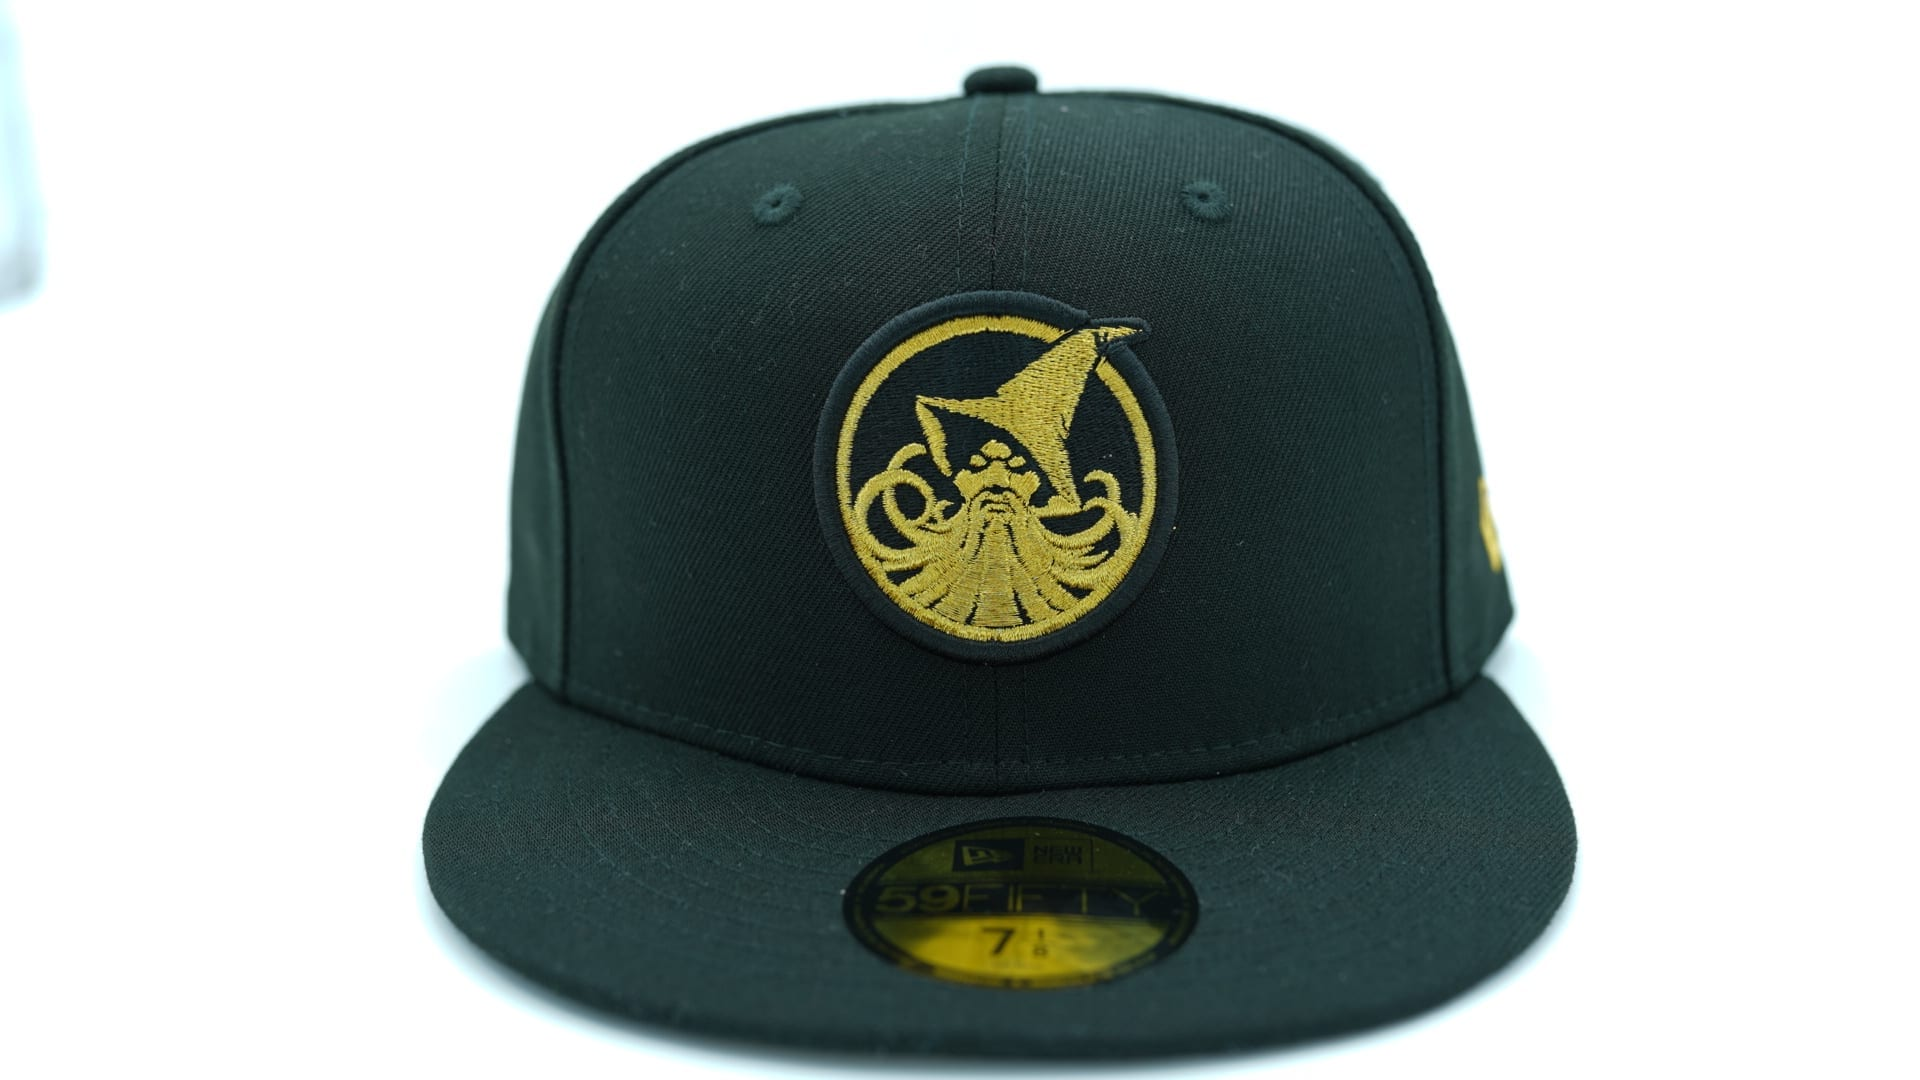 kc royals fitted baseball cap field flannels city monarchs hat kansas blues hats